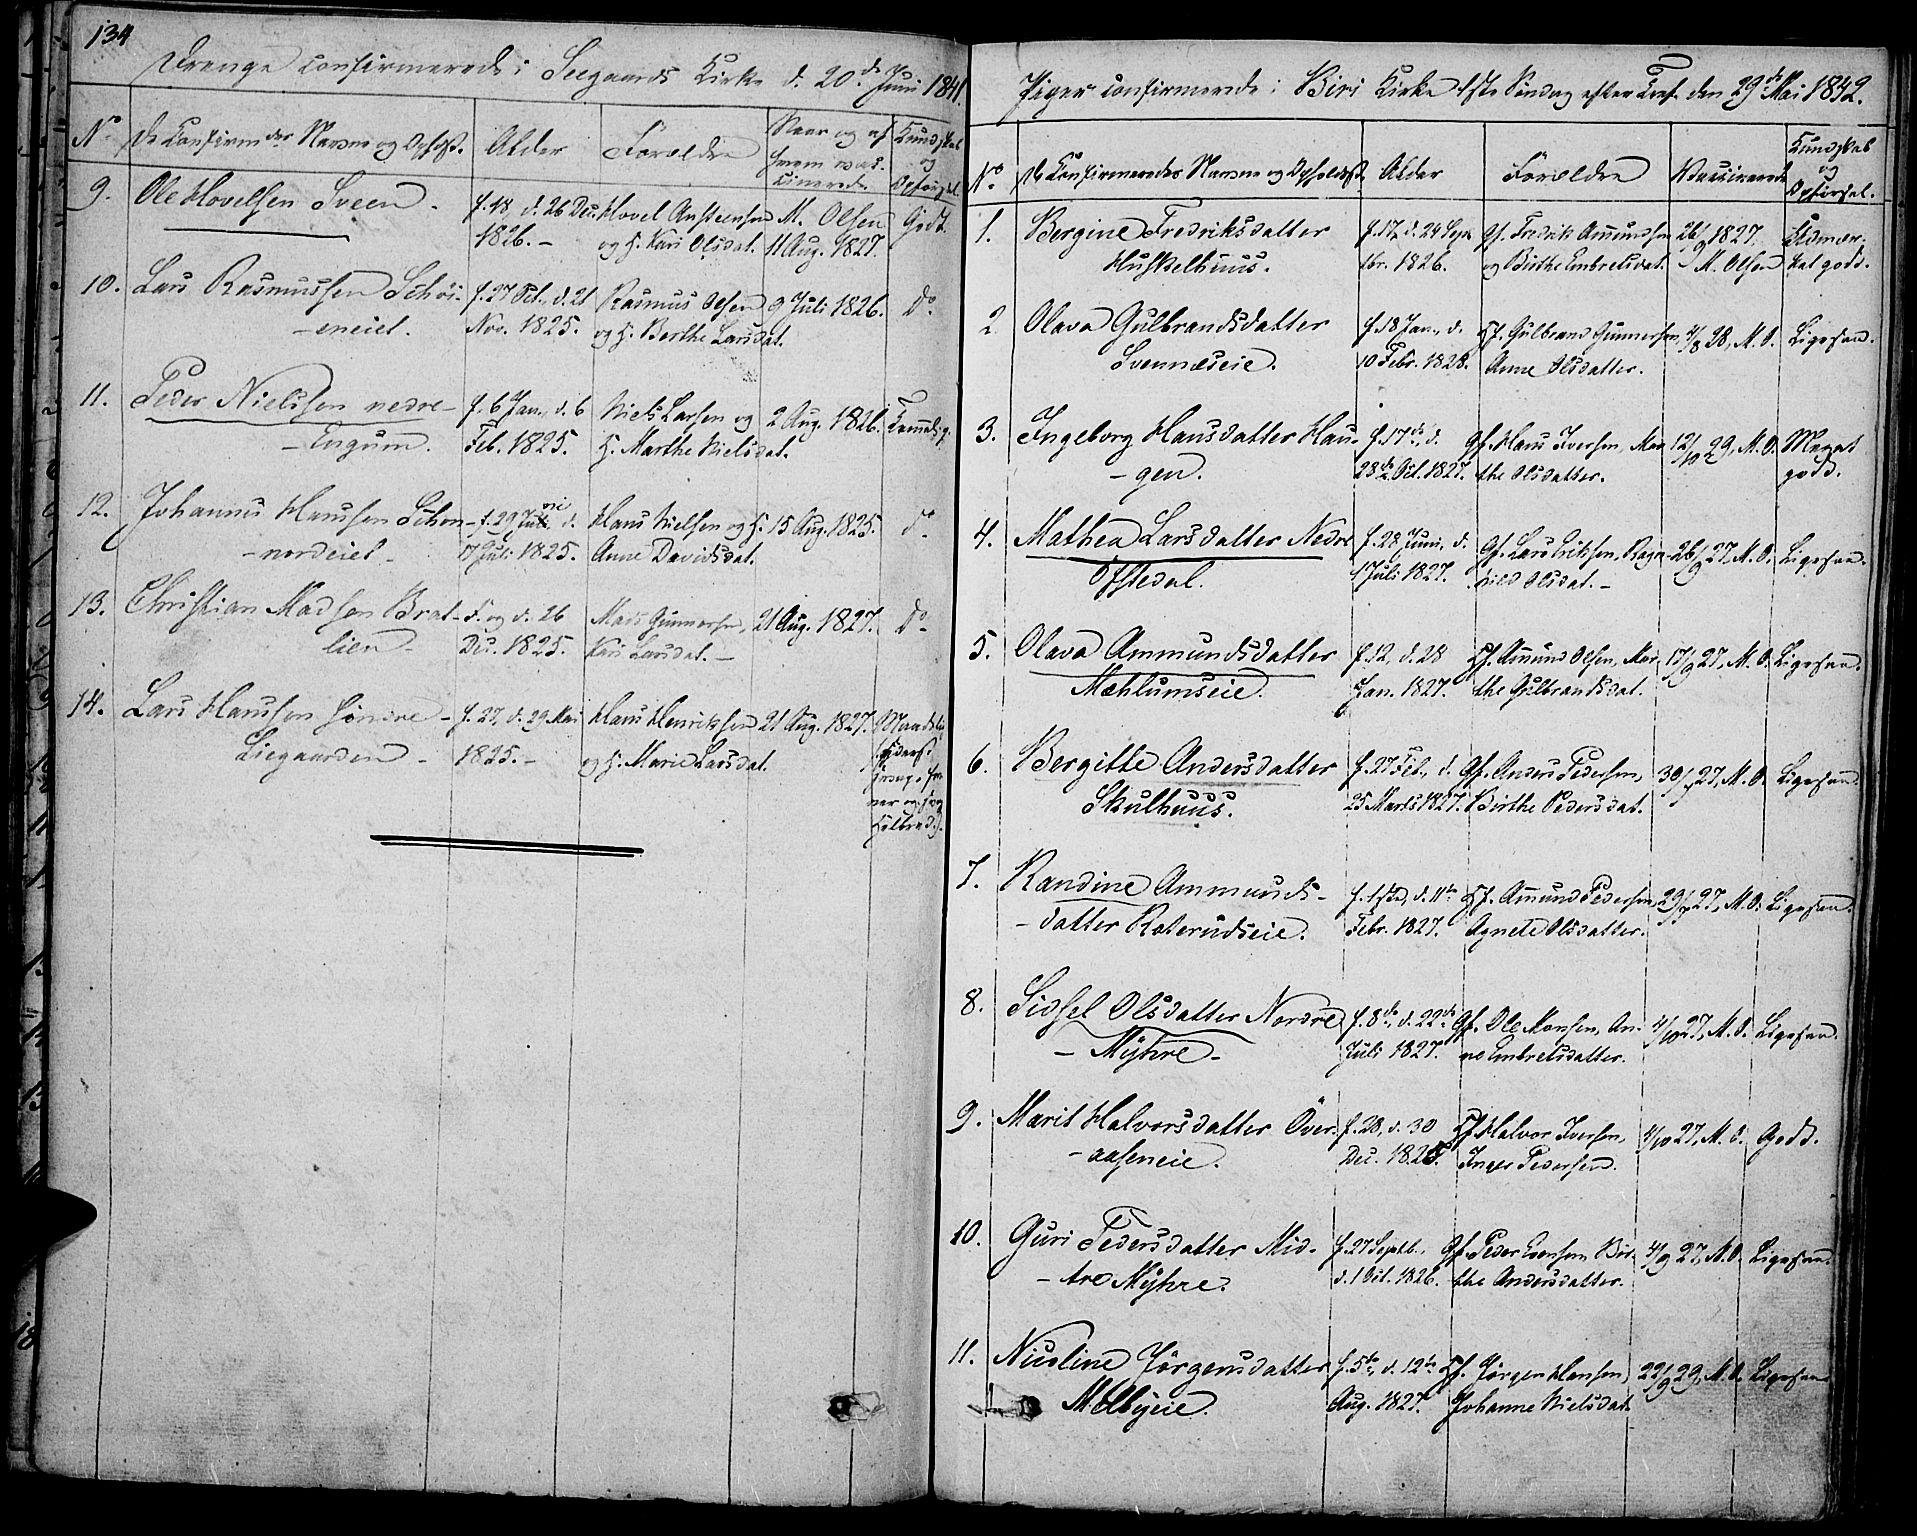 SAH, Biri prestekontor, Ministerialbok nr. 4, 1829-1842, s. 134